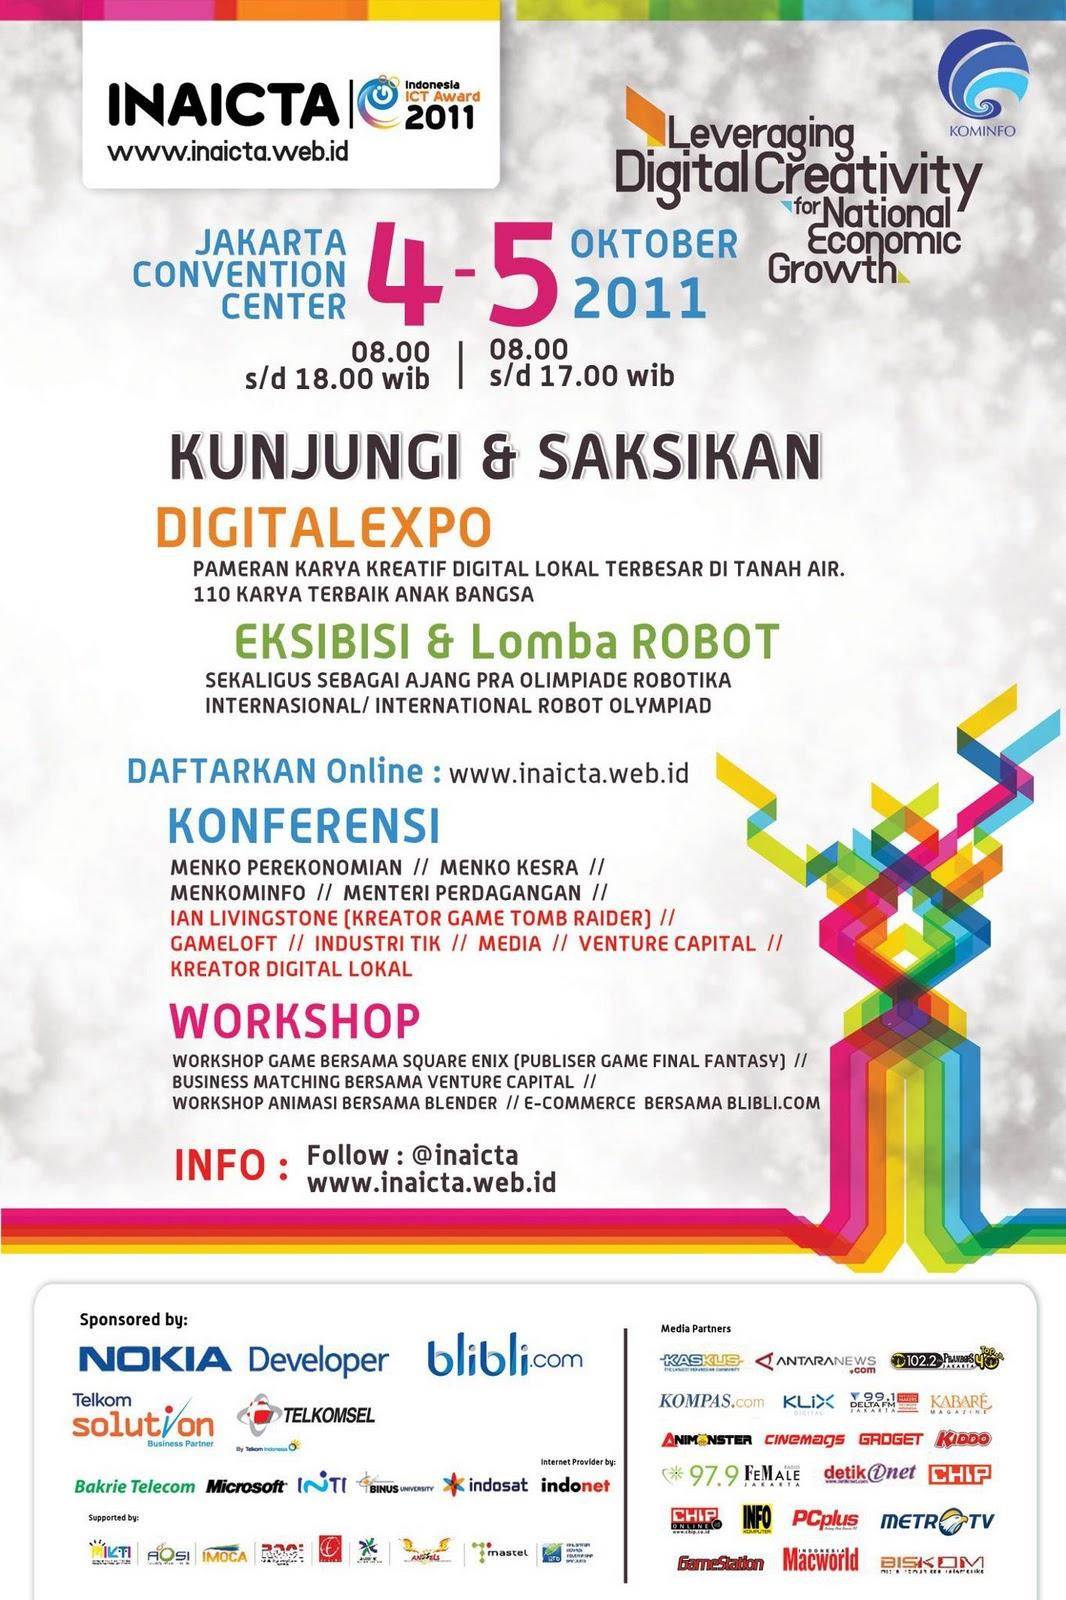 SKACI Pencetak Anak Jago Komputer Inaicta 2011 Jakarta